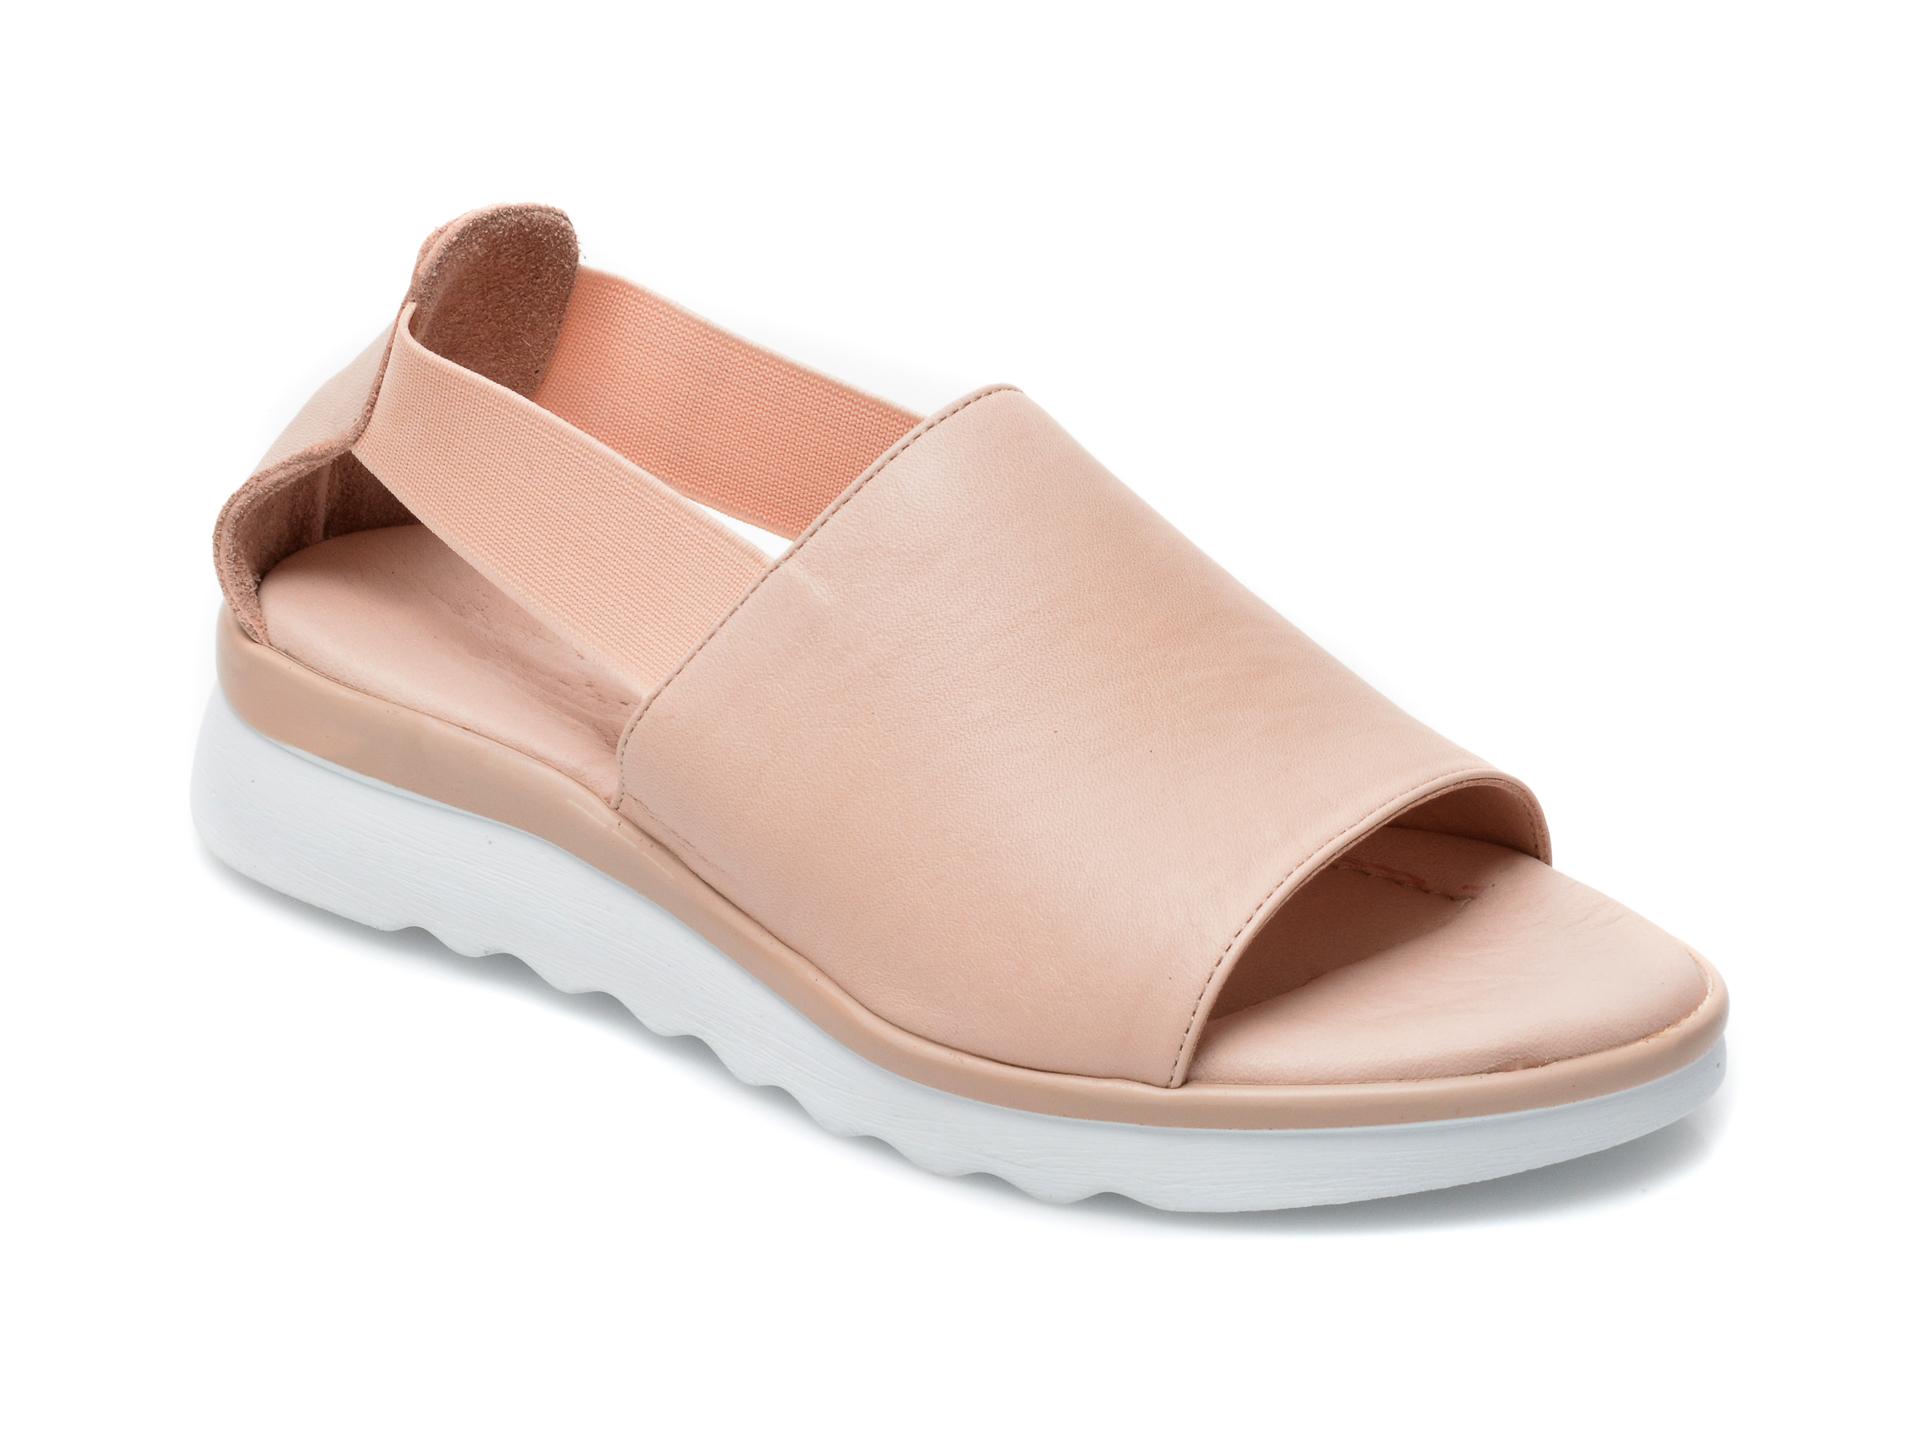 Sandale FLAVIA PASSINI nude, EI24501, din piele naturala